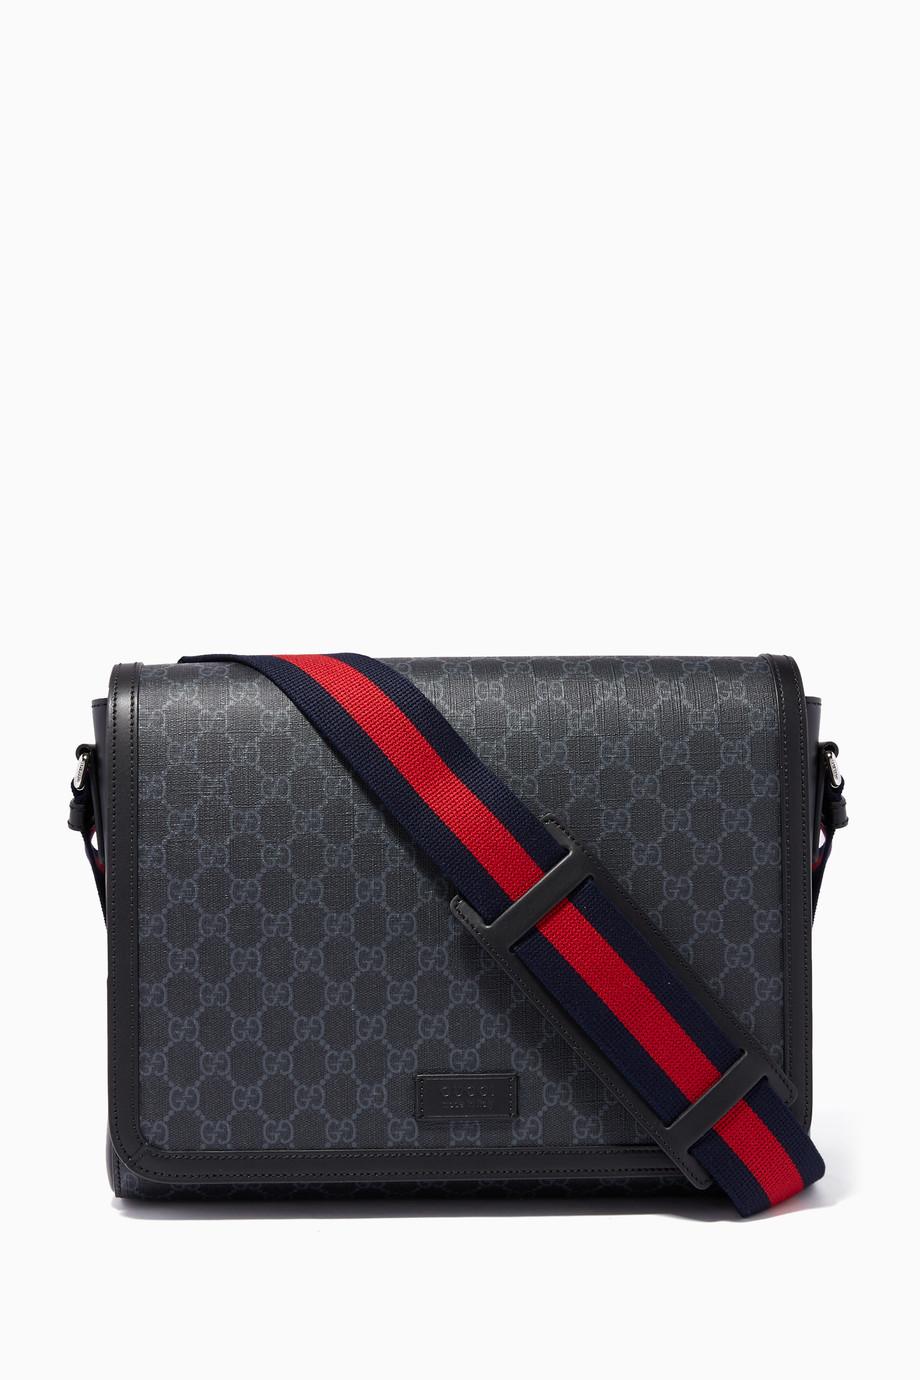 480aea6e7faf Shop Gucci Black Black & Grey GG Supreme Messenger Bag for Men | Ounass